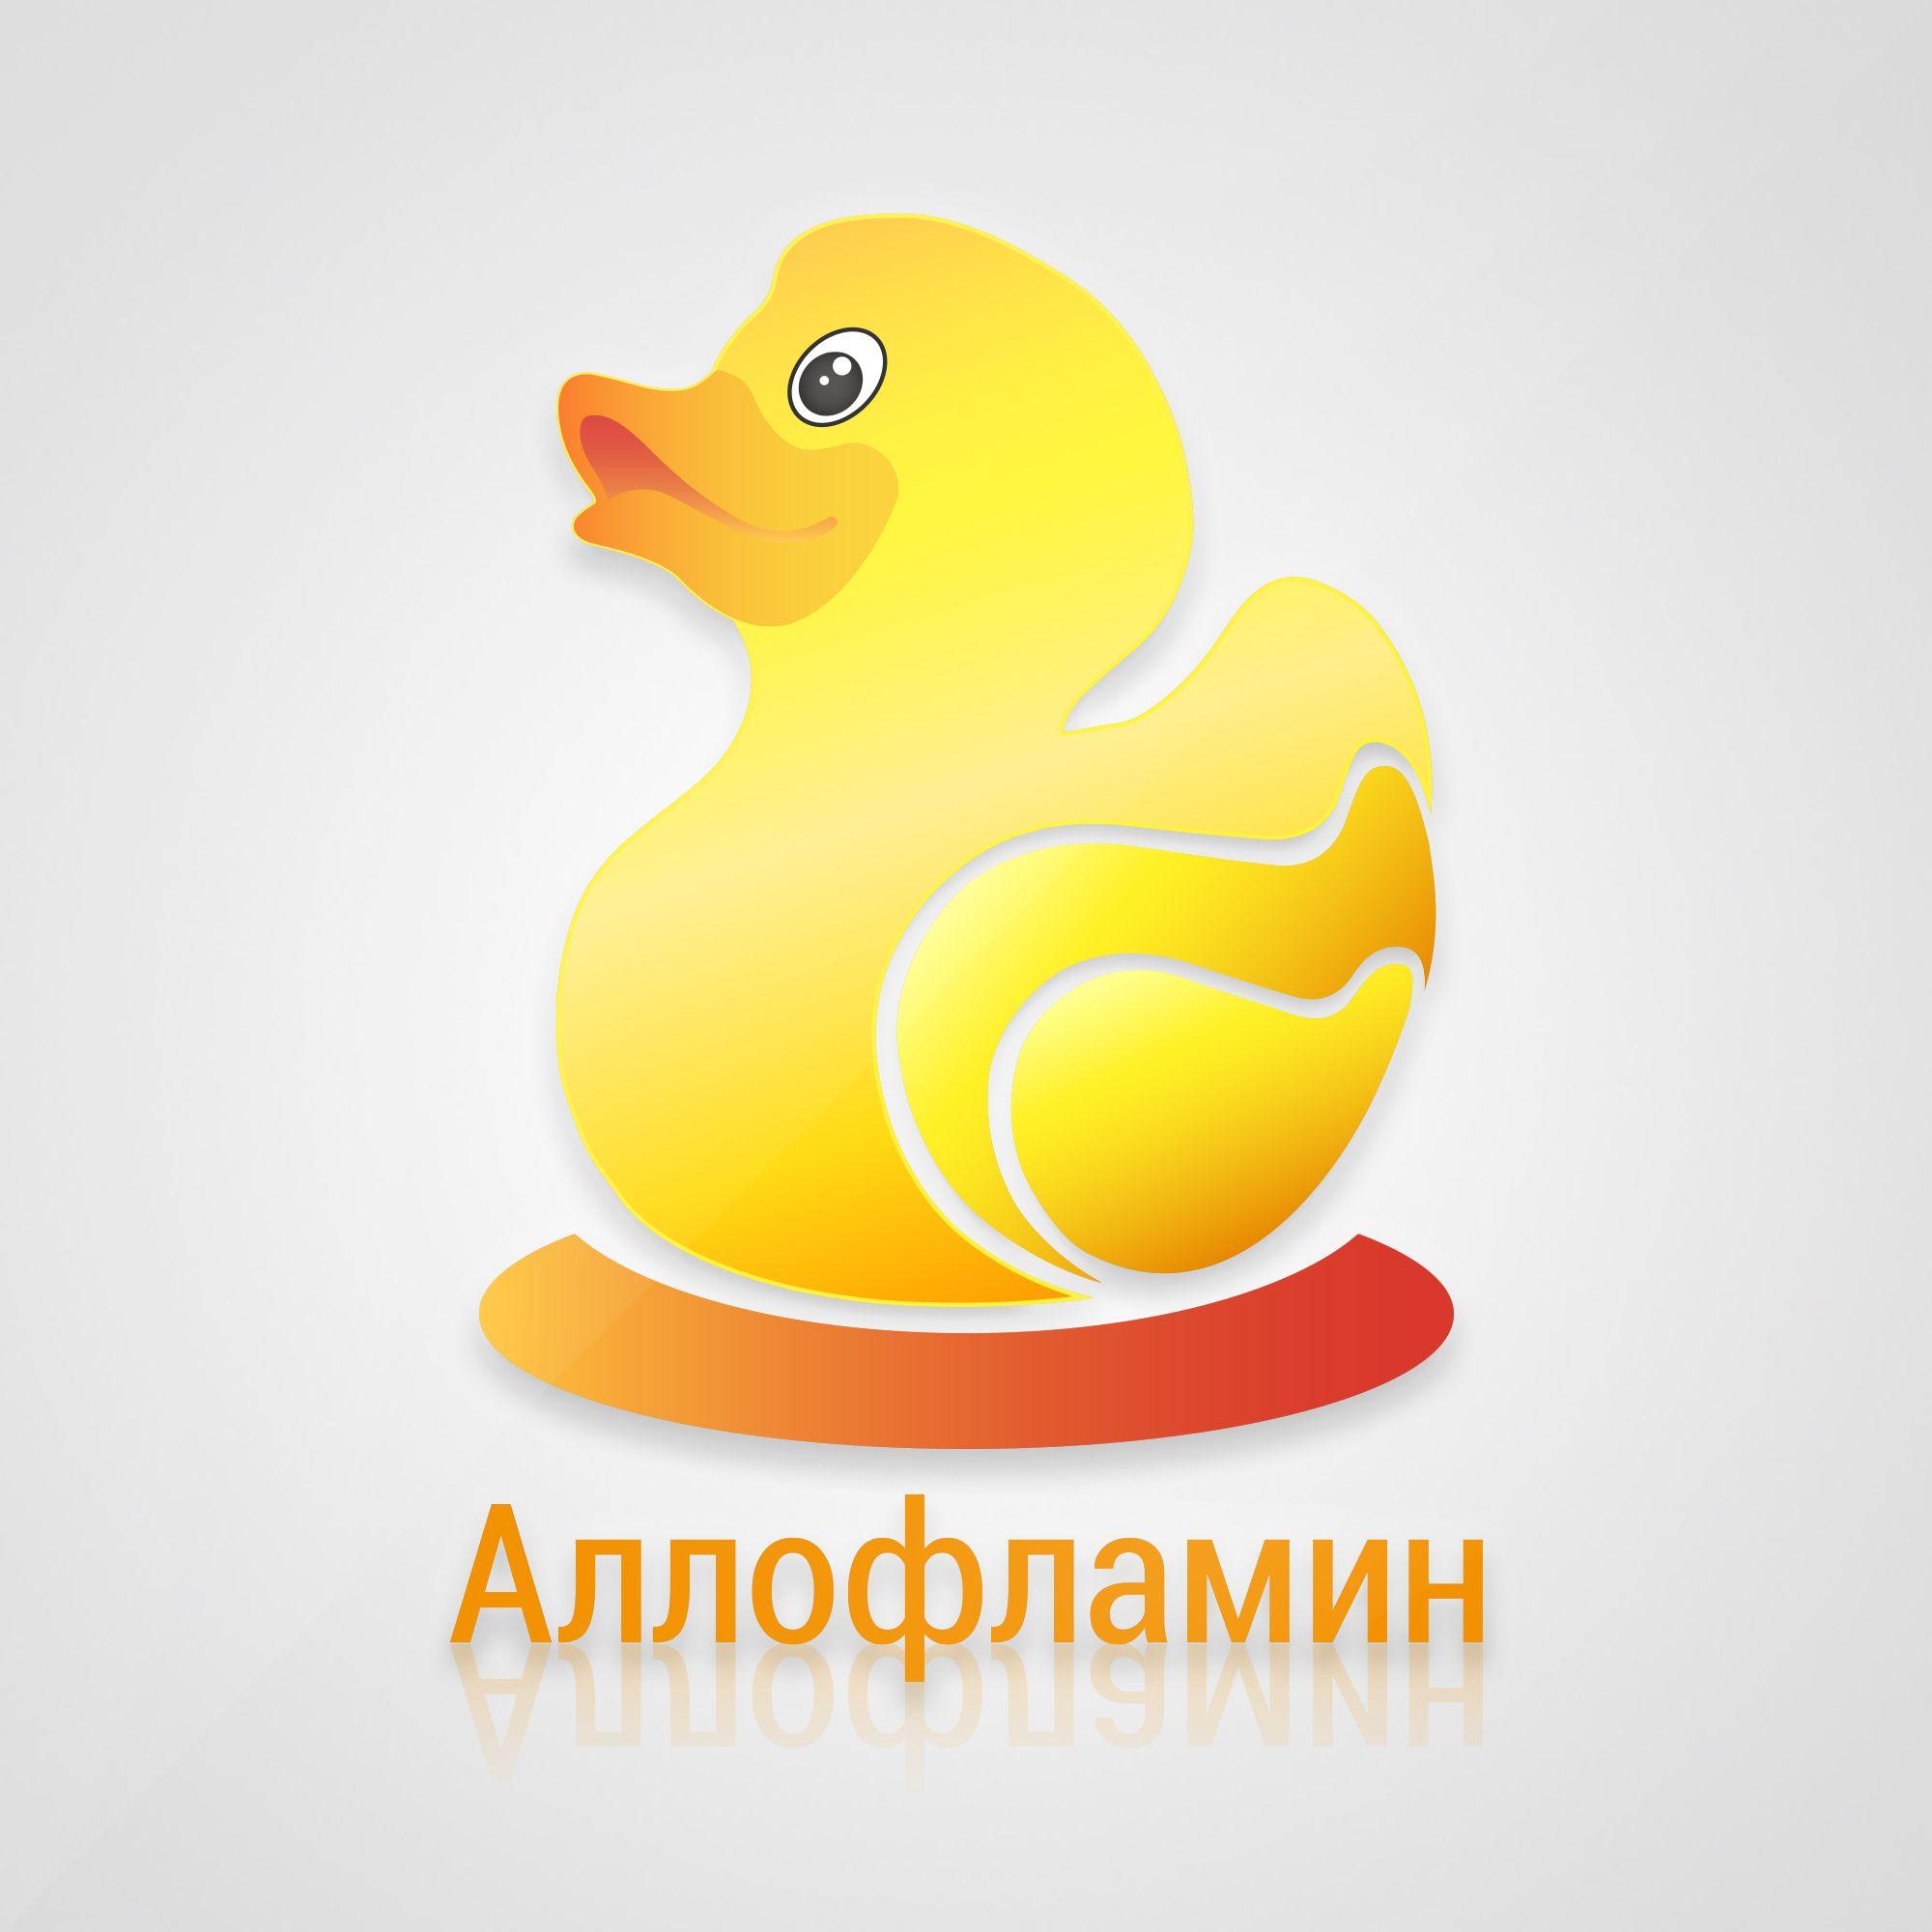 Логотип препарата Аллофламин - дизайнер dmitry_banin